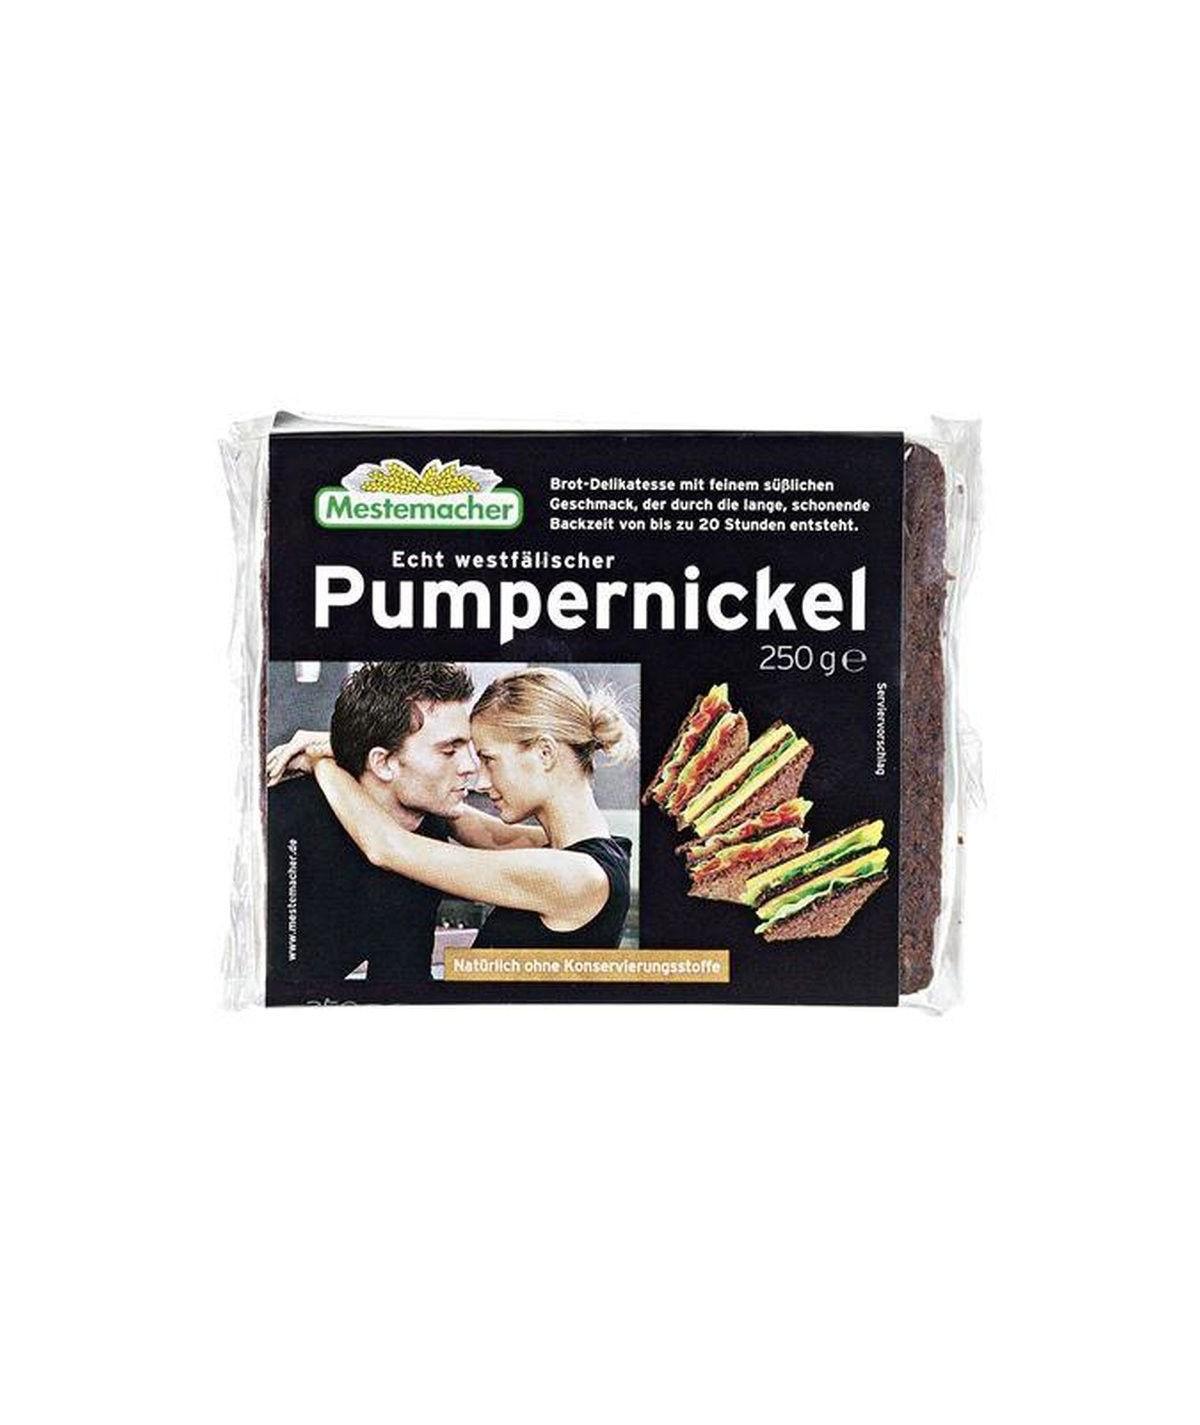 Pumpernickel echt westfälisch Mestemacher 250 g